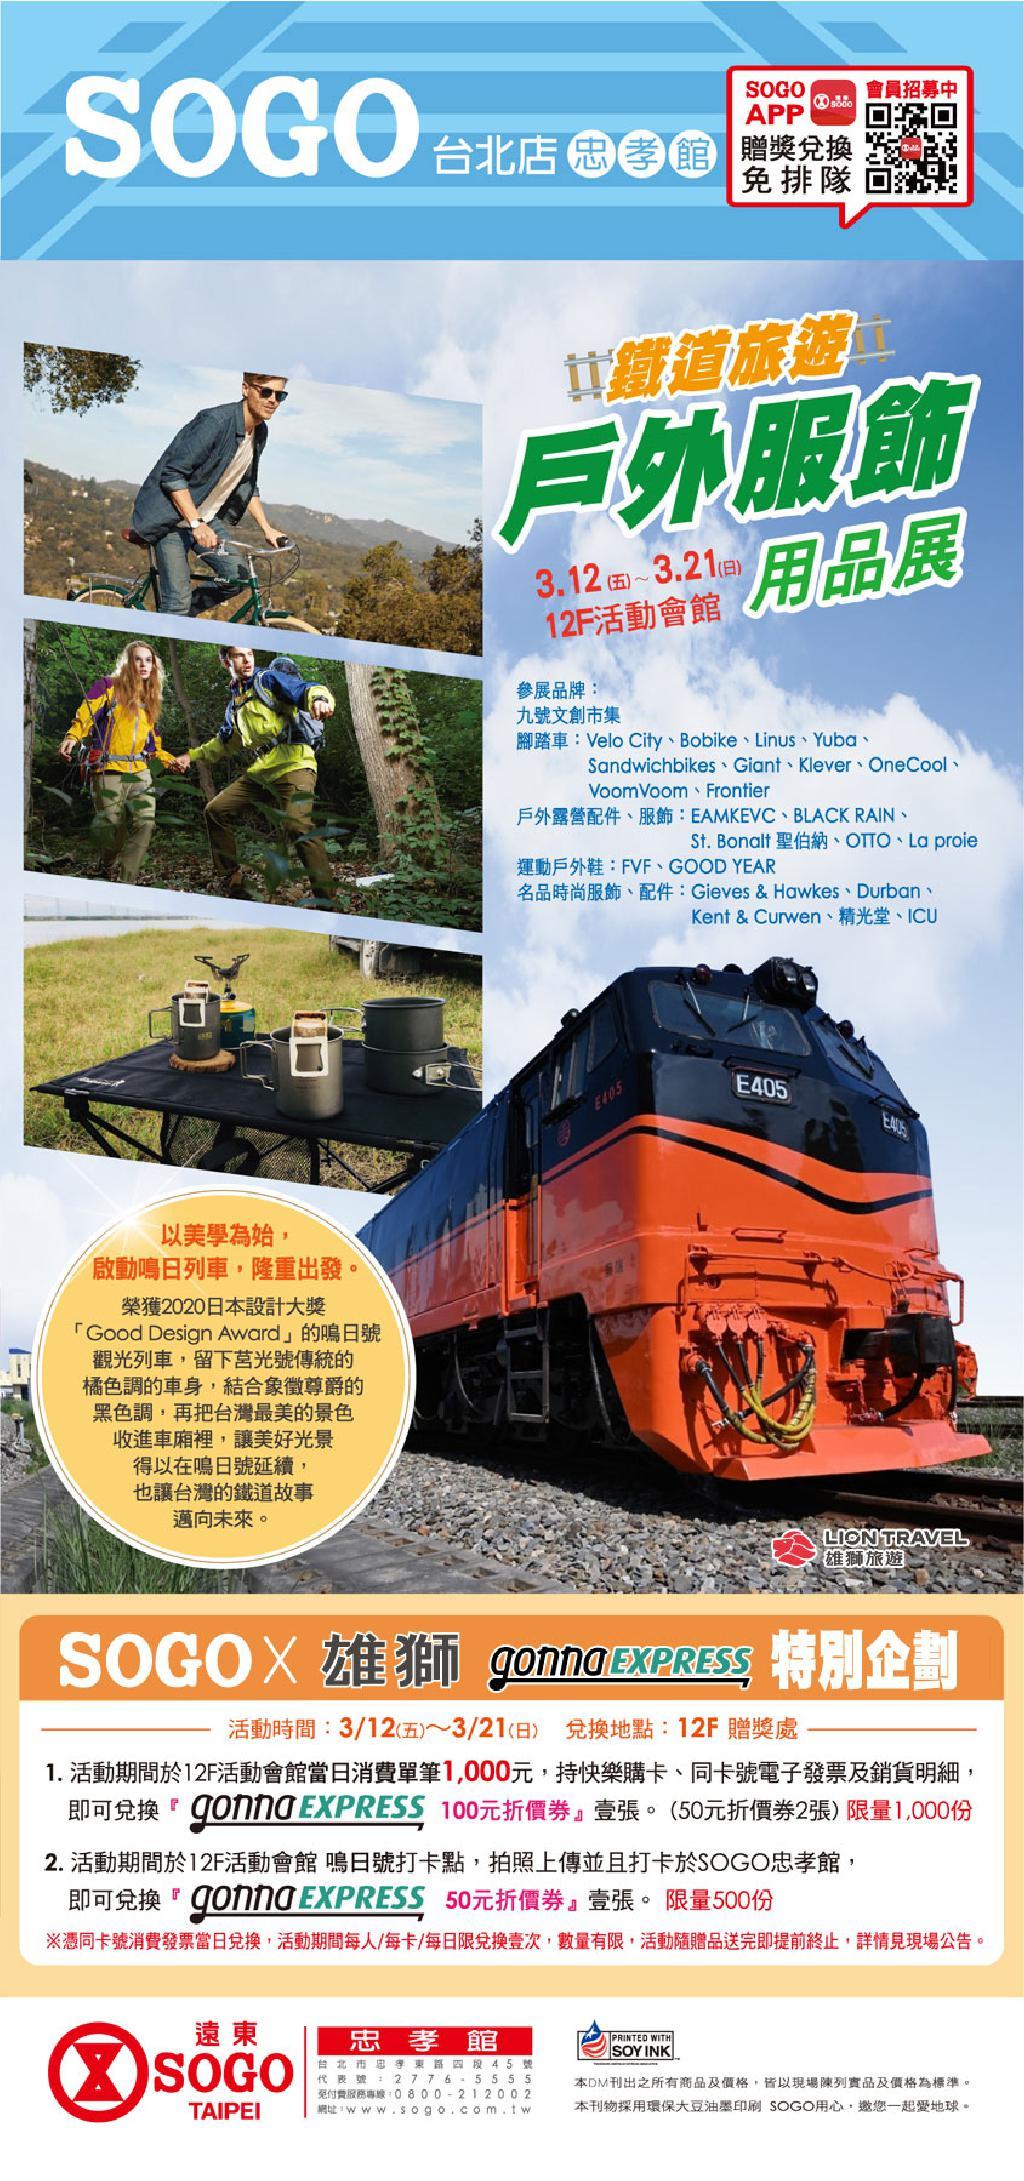 SOGO《台北忠孝館》DM 「12F活動會館「鐵道旅遊 戶外服飾用品展」」【2021/3/21 止】